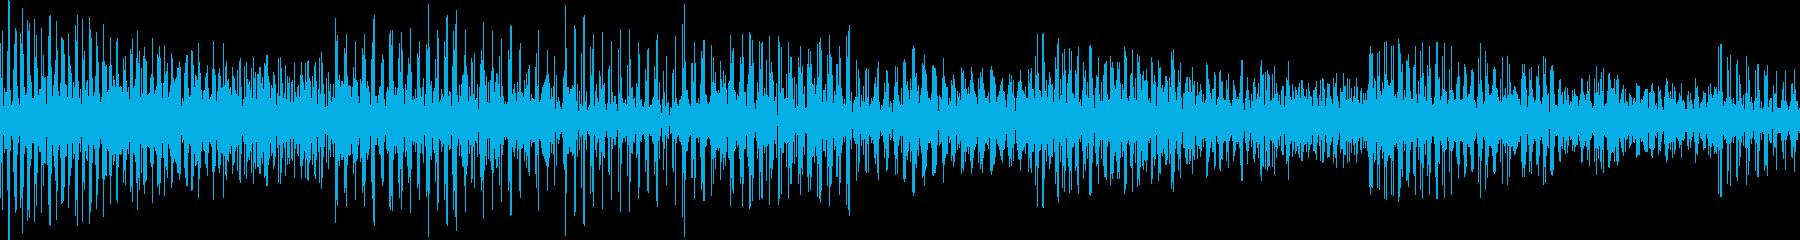 AMGアナログFX 10の再生済みの波形